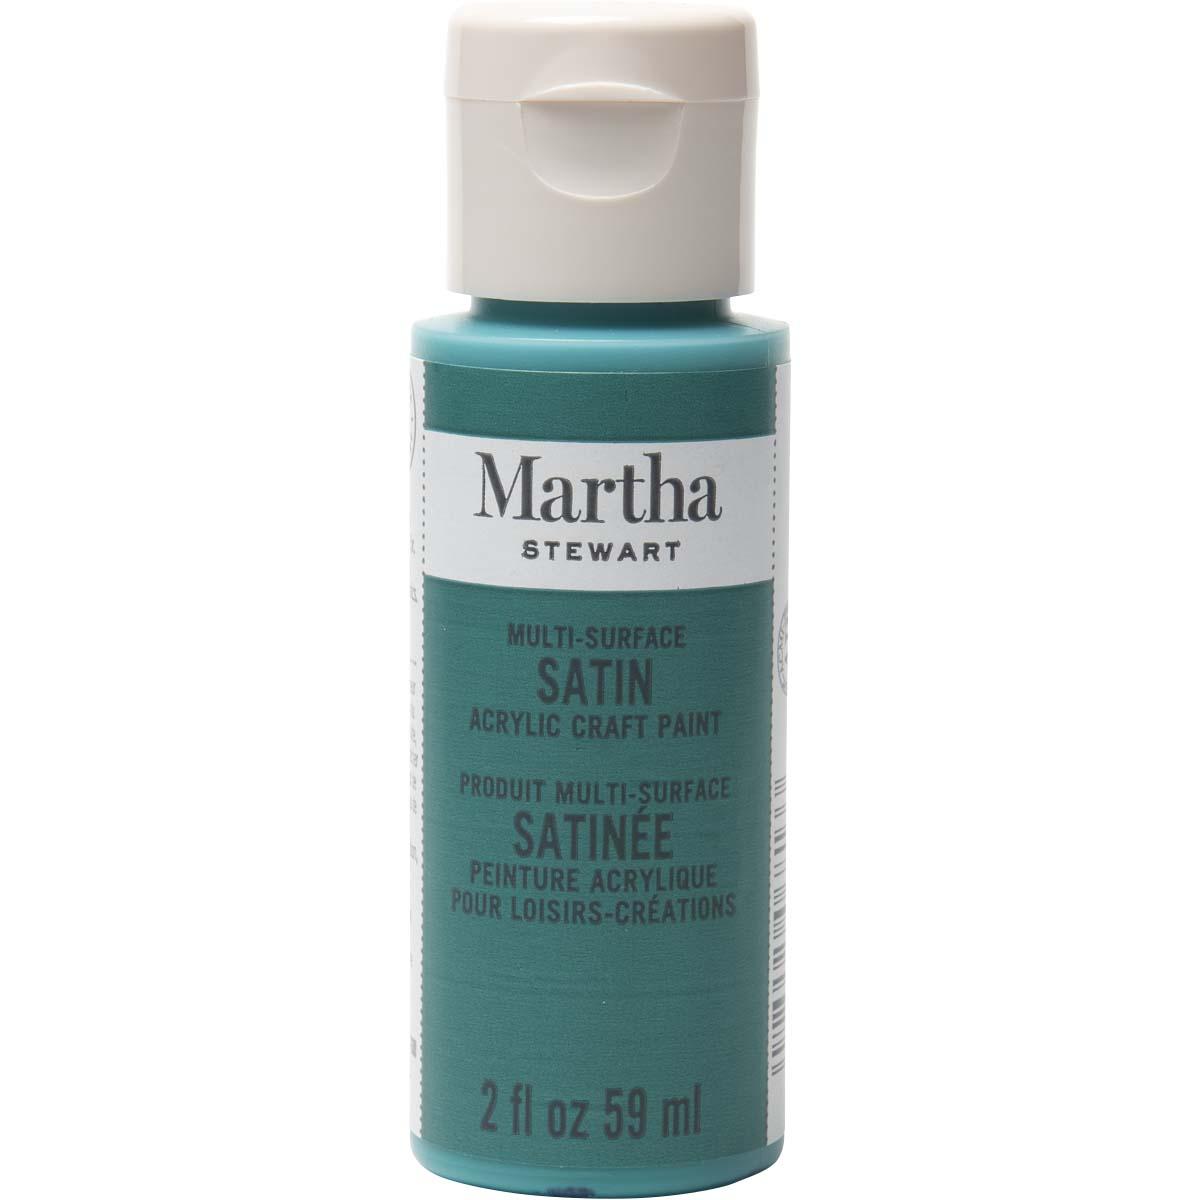 Martha Stewart® 2oz Multi-Surface Satin Acrylic Craft Paint - Mermaid Teal